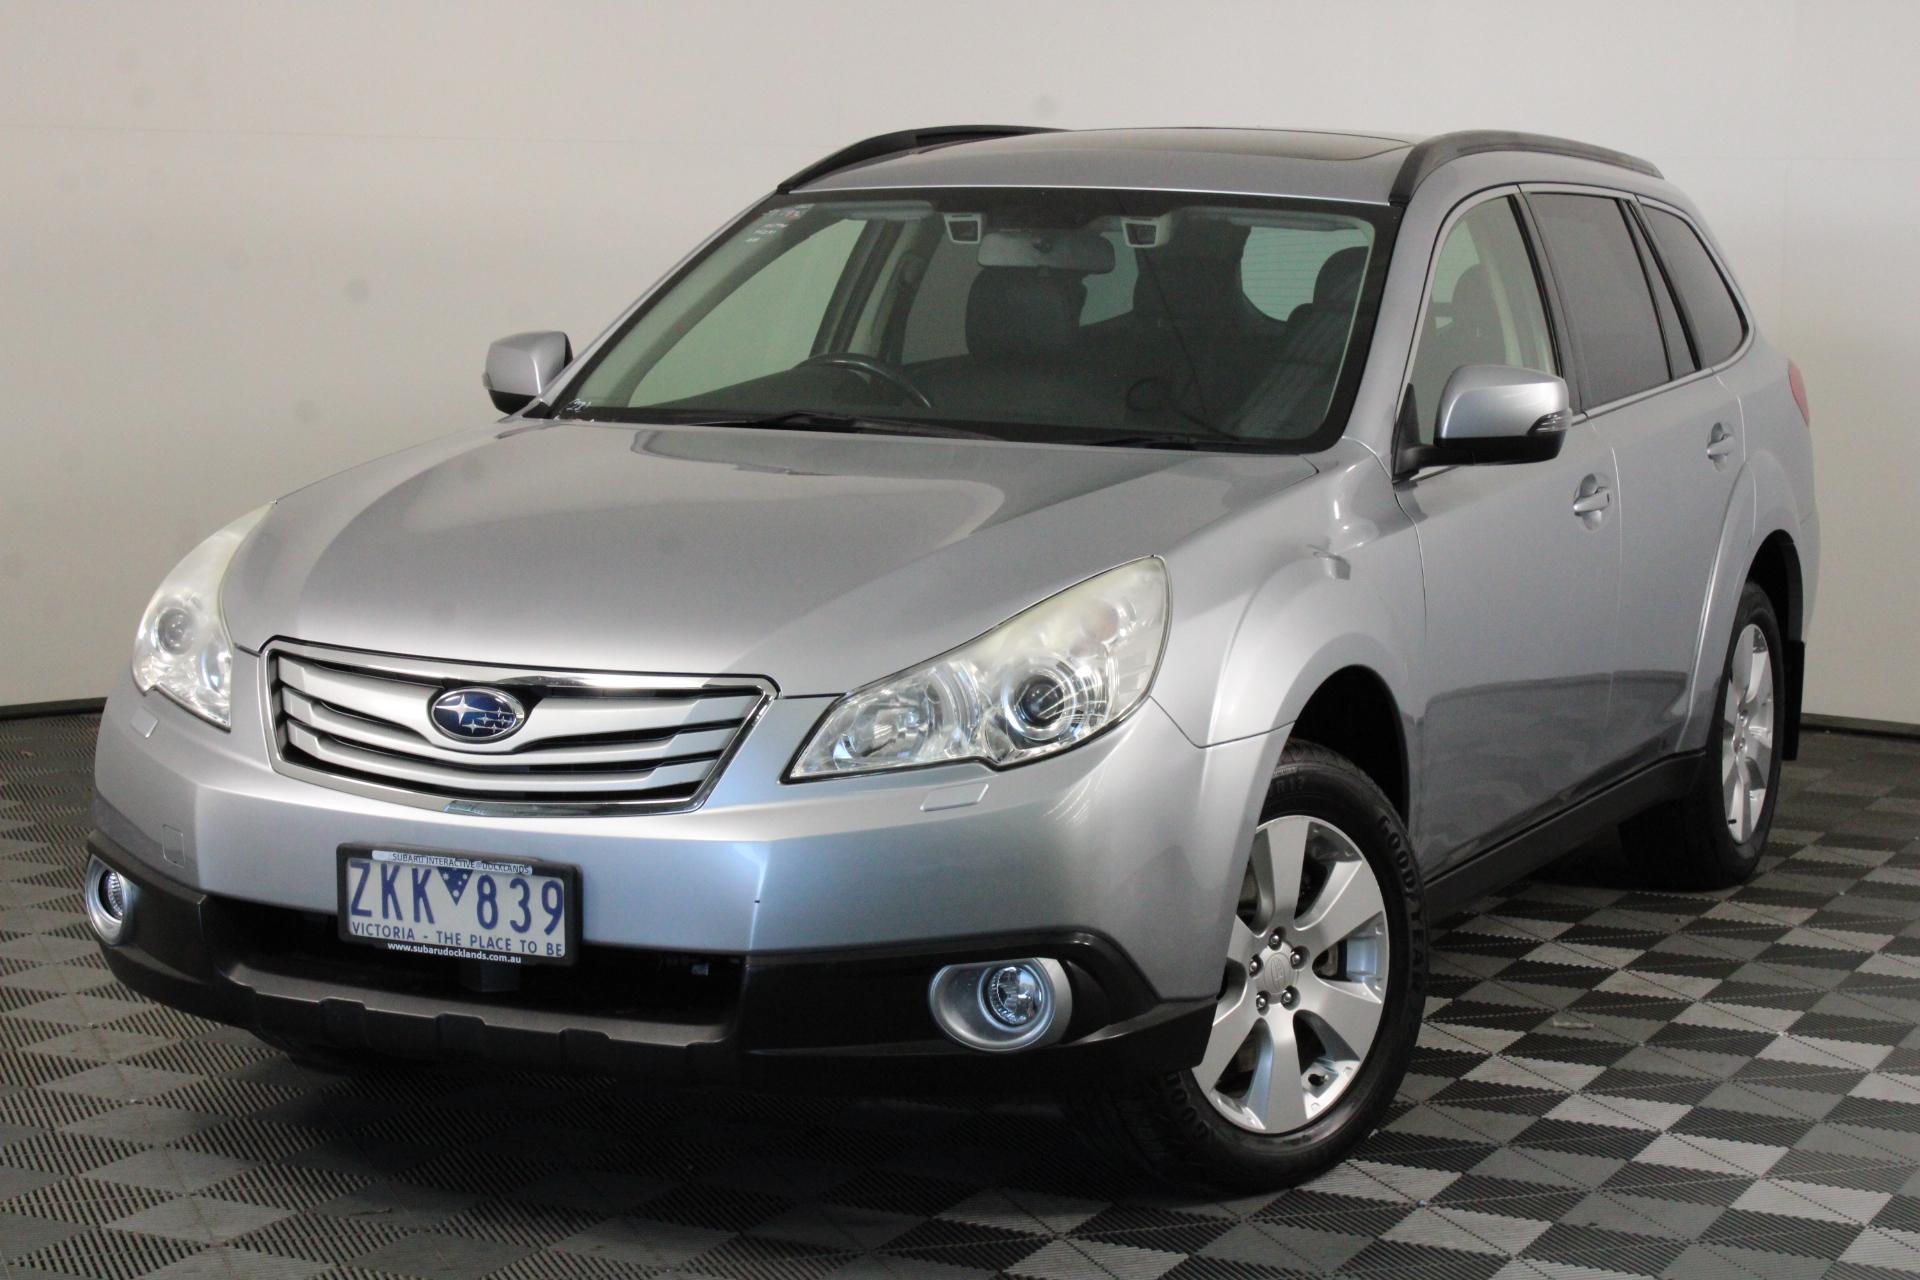 2012 Subaru Outback 3.6R PREMIUM B5A Automatic Wagon